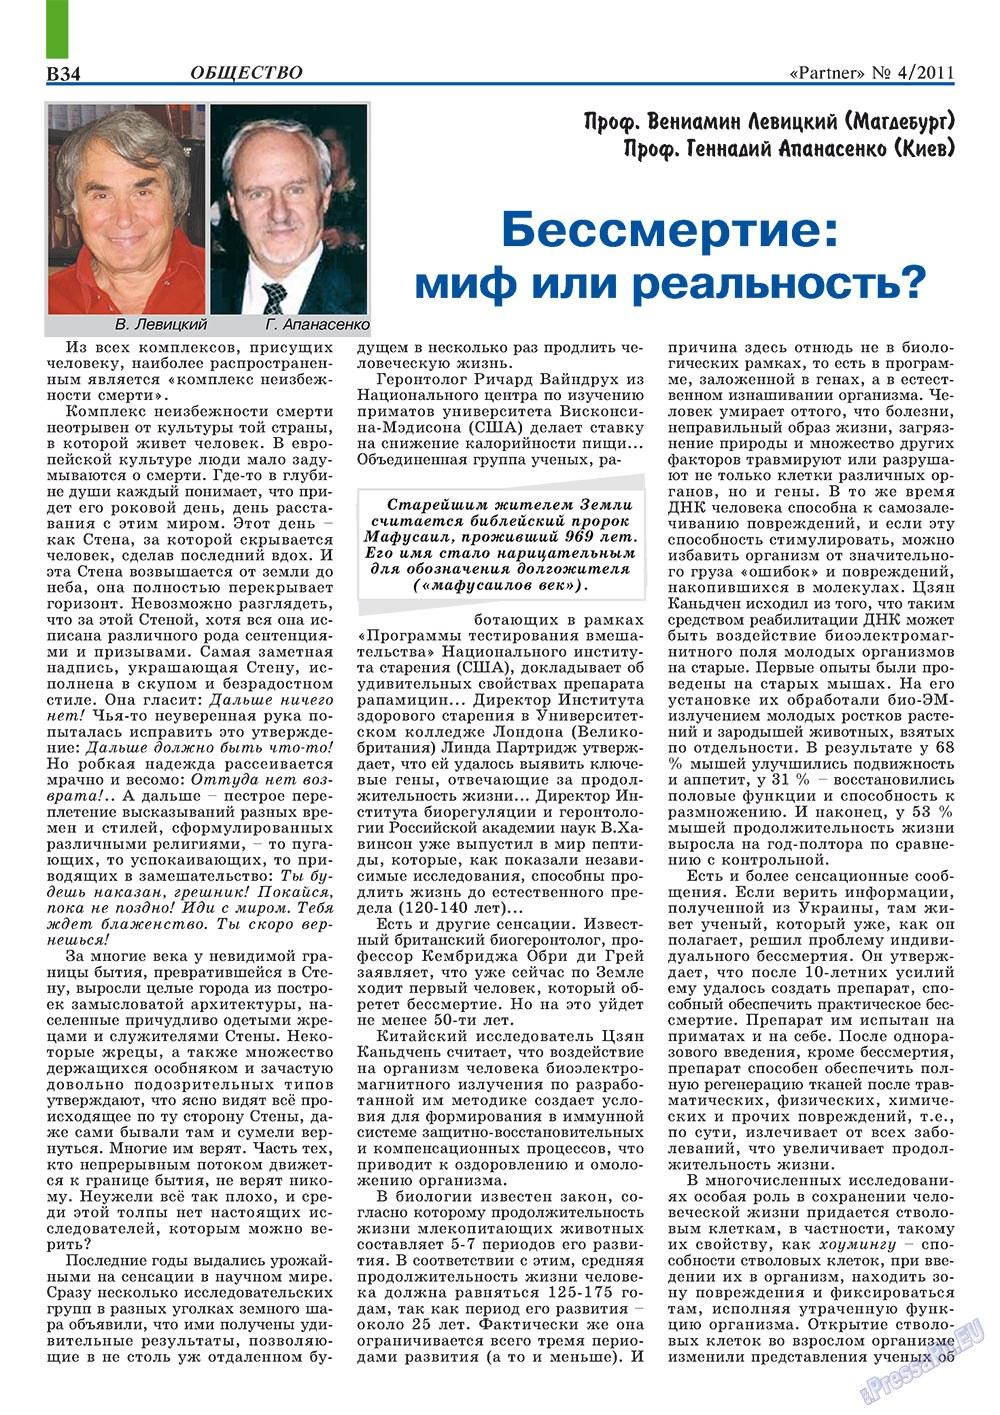 Партнер-север (журнал). 2011 год, номер 4, стр. 44